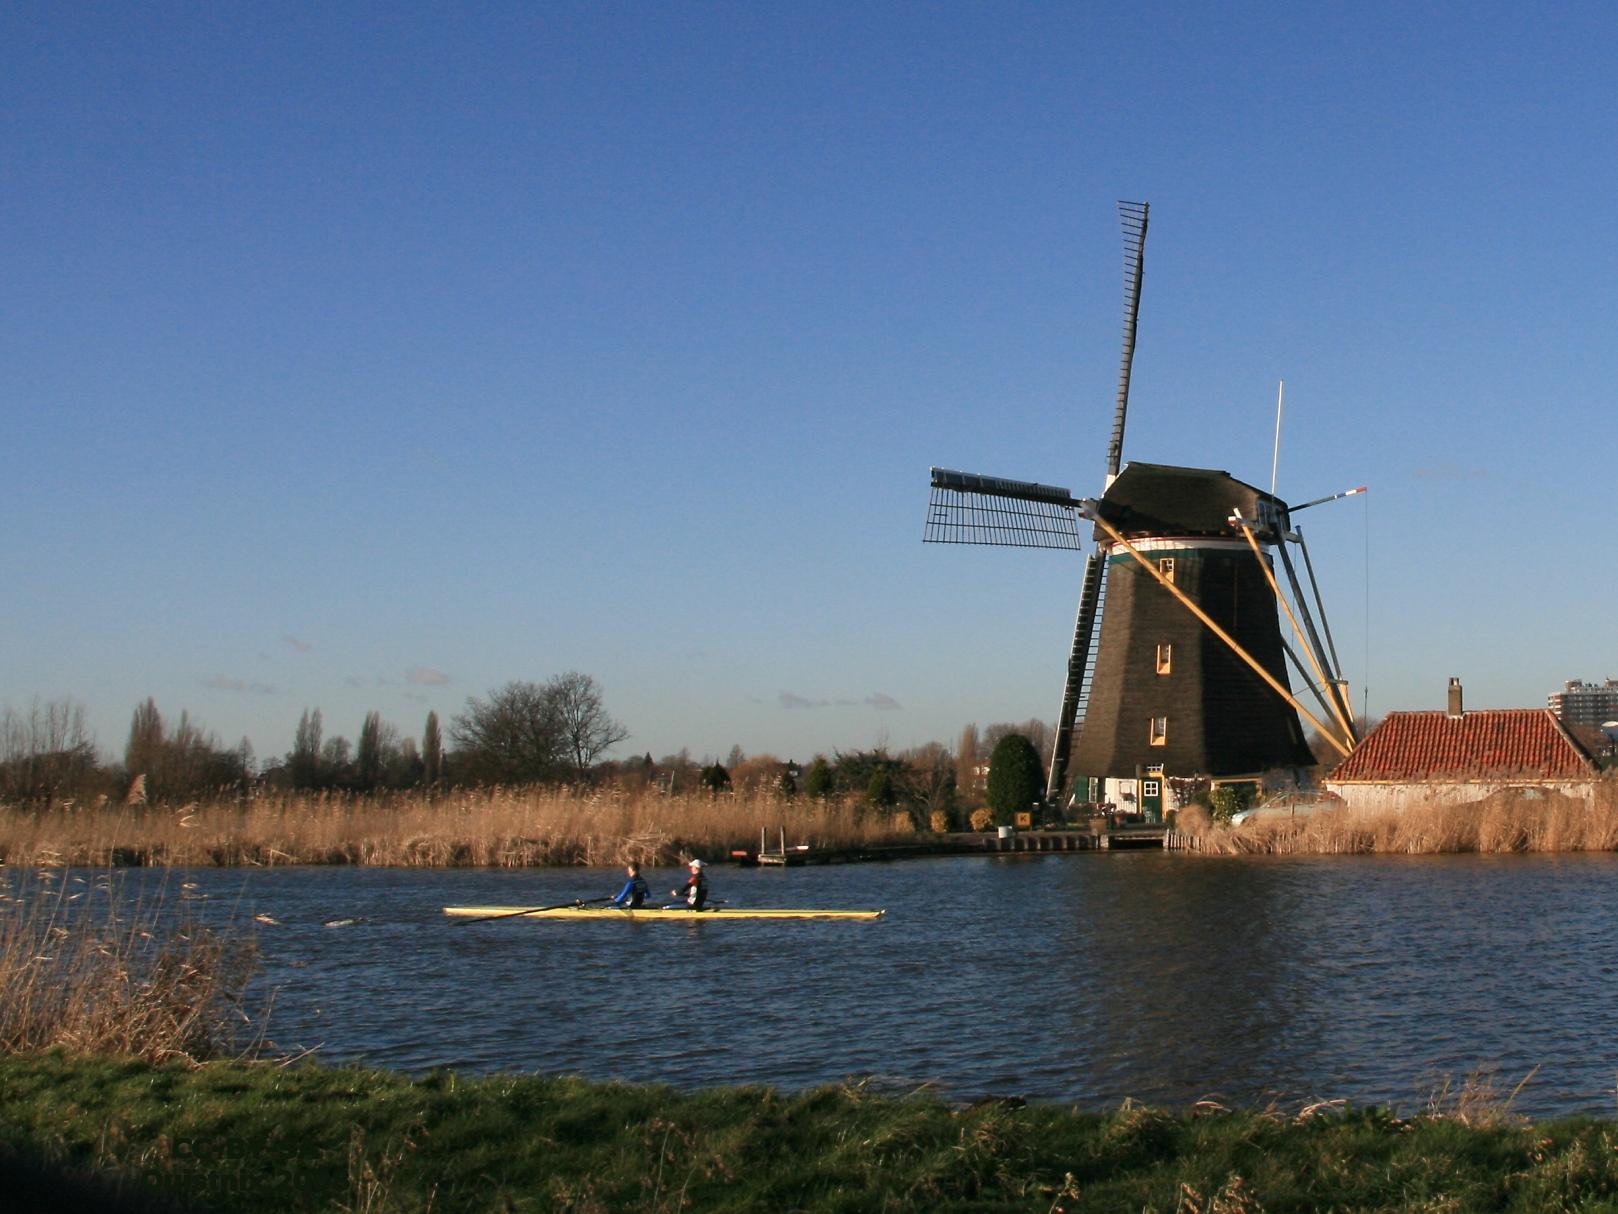 https://upload.wikimedia.org/wikipedia/commons/4/4c/Rotterdam-Hillegersberg_De_Prinsenmolen_vanaf_overzijde_Rotte.jpg